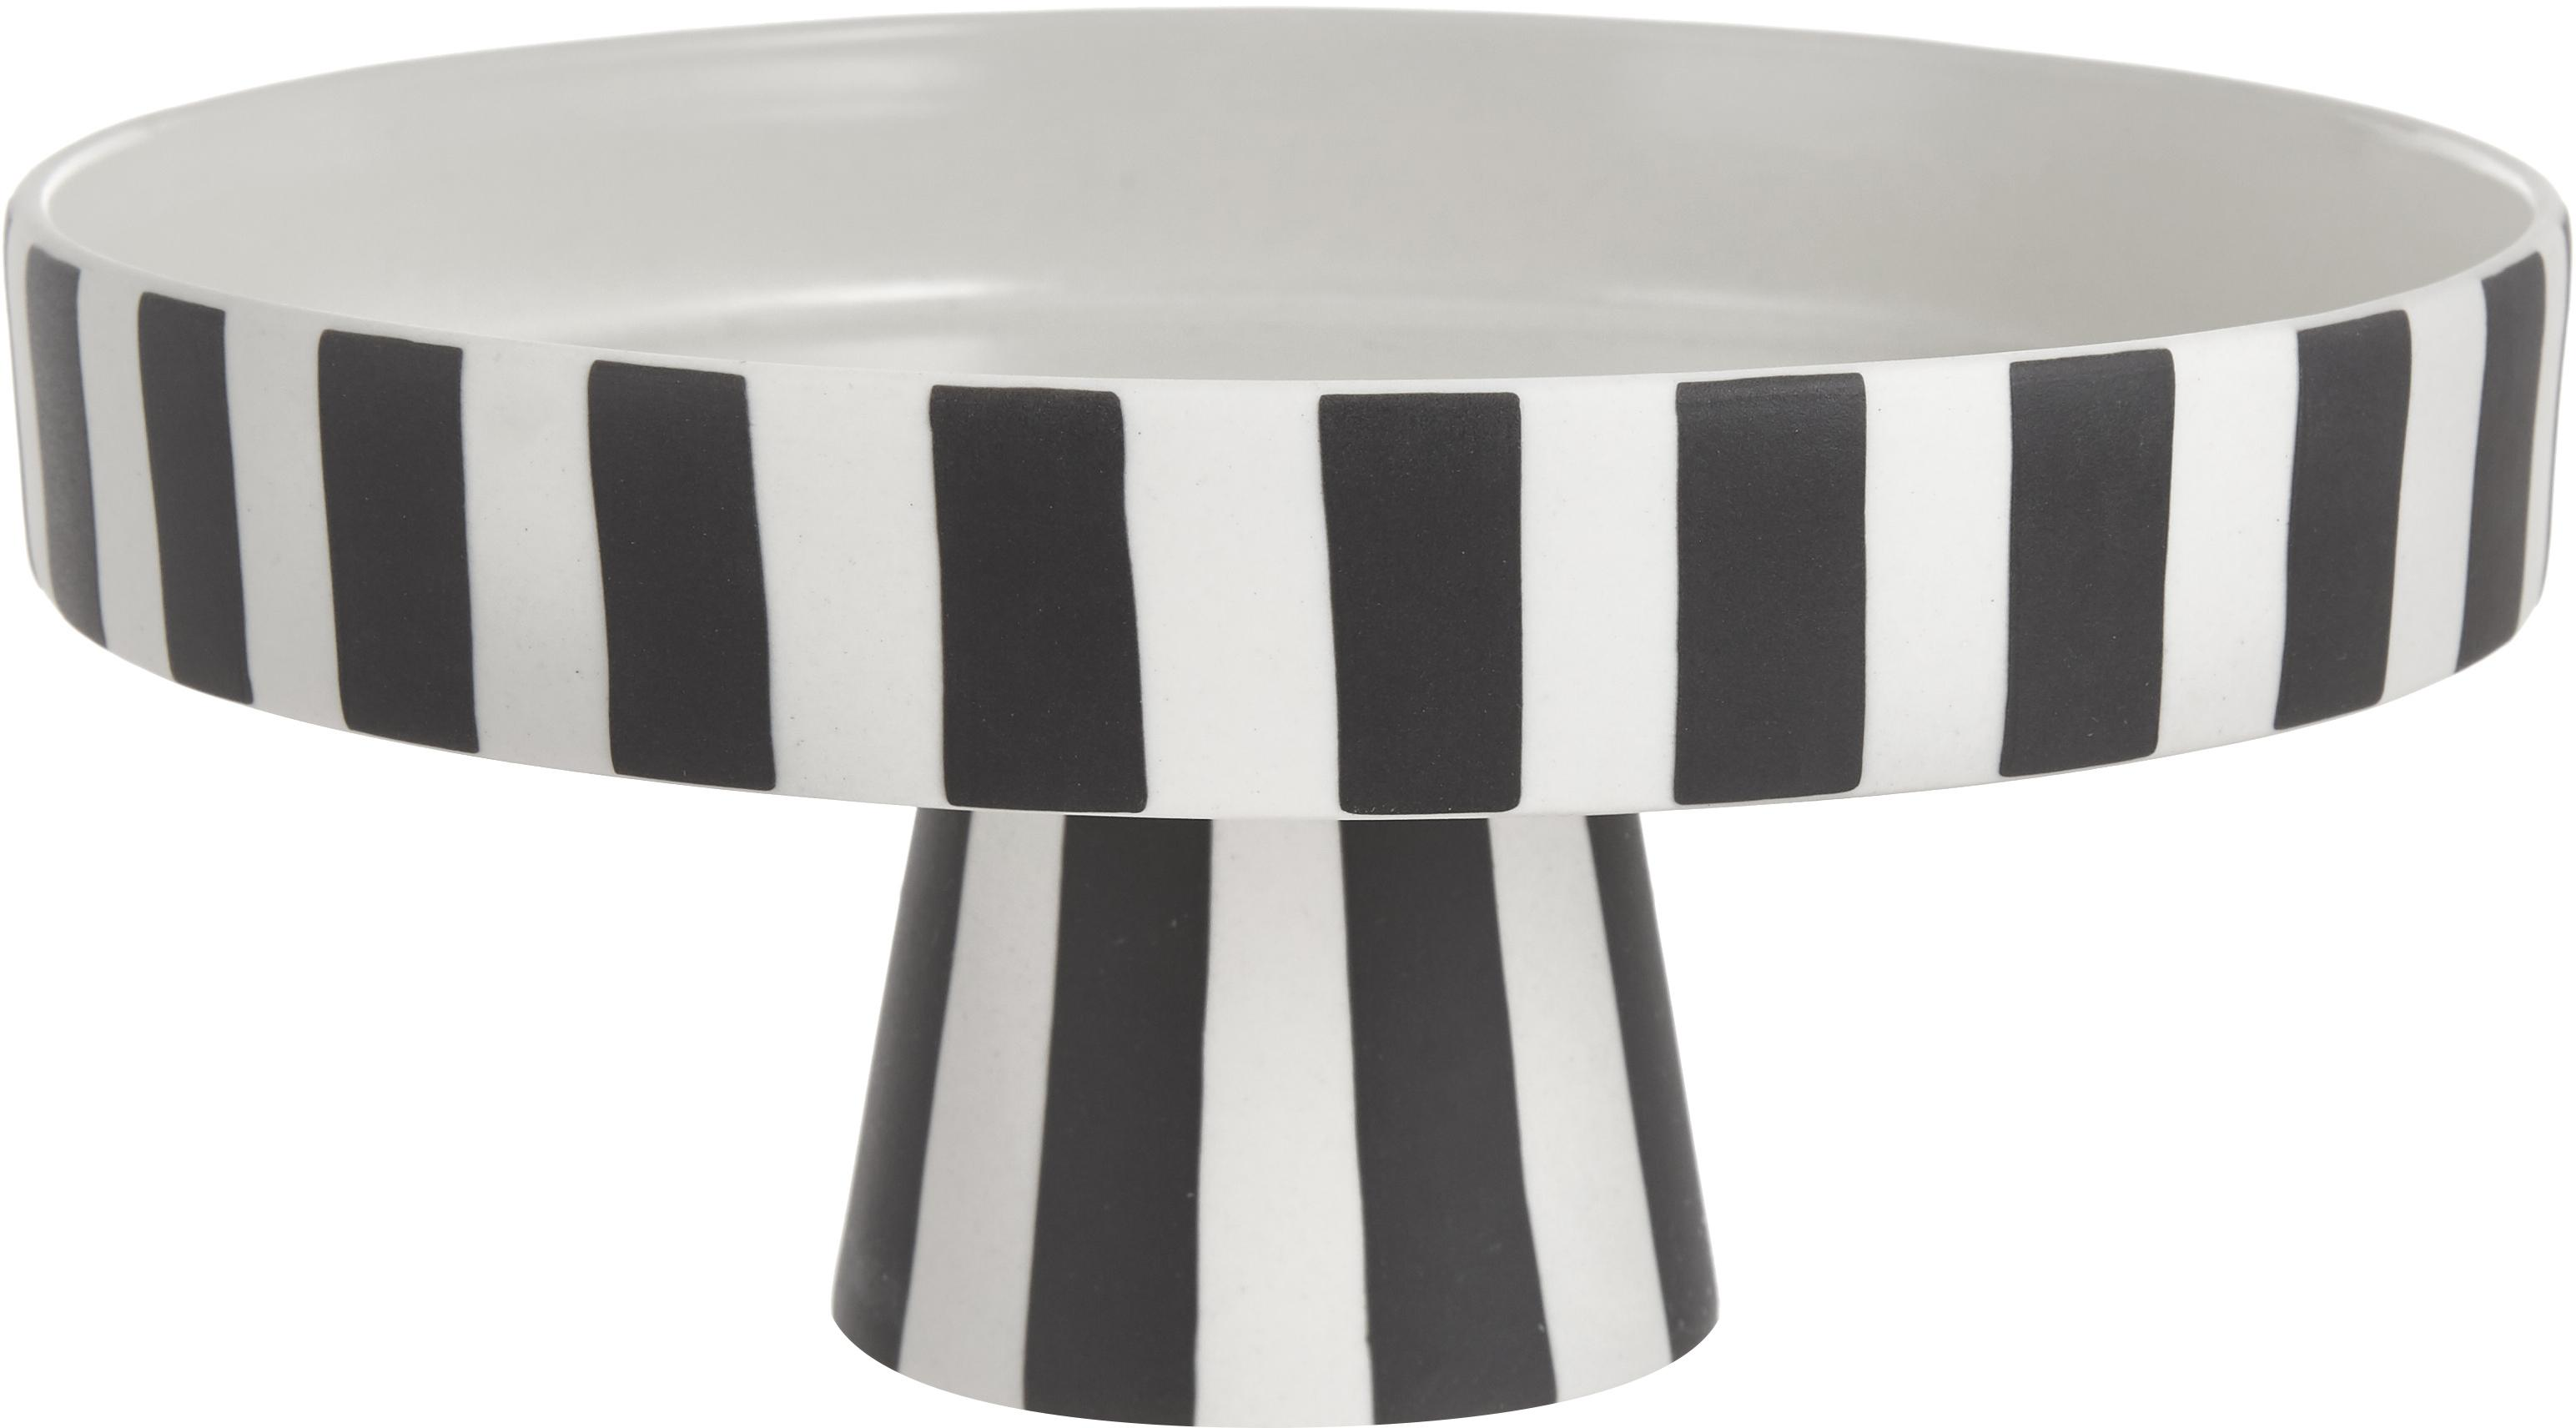 Taartplateau Toppu, Keramiek, Wit, zwart, Ø 20 x H 9 cm